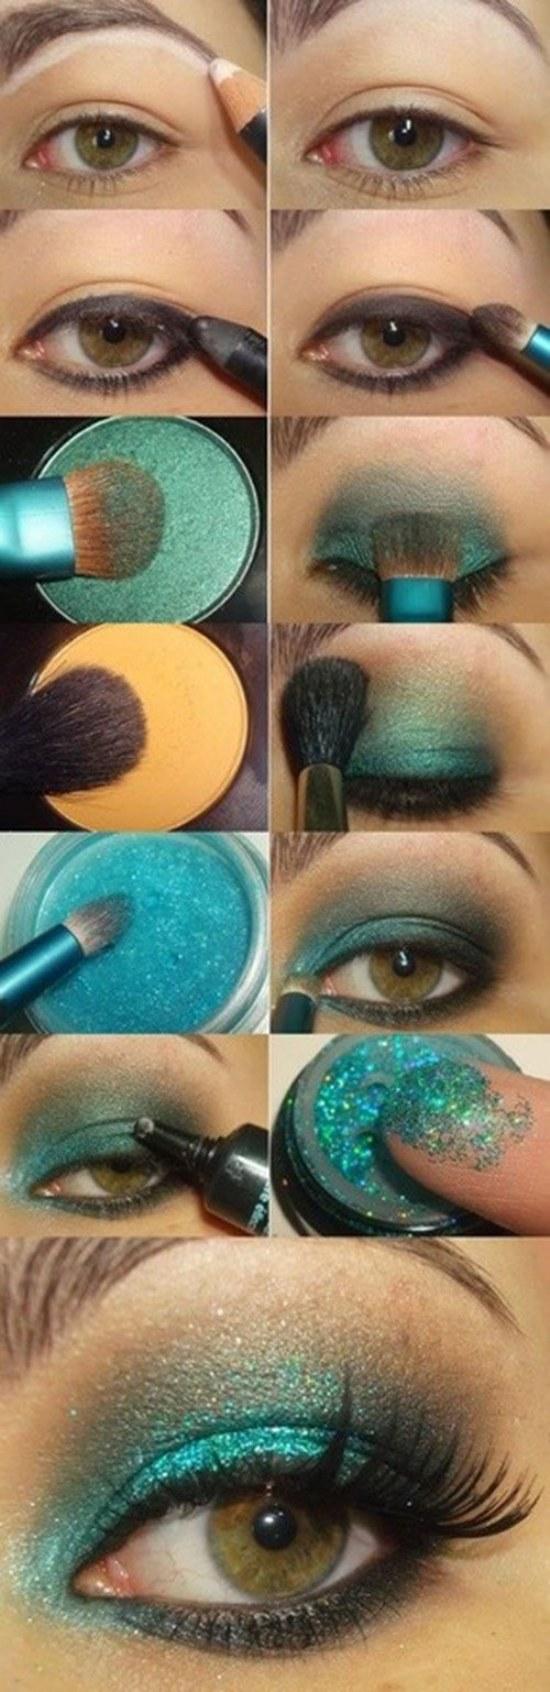 maquillaje sombras ojos verdes